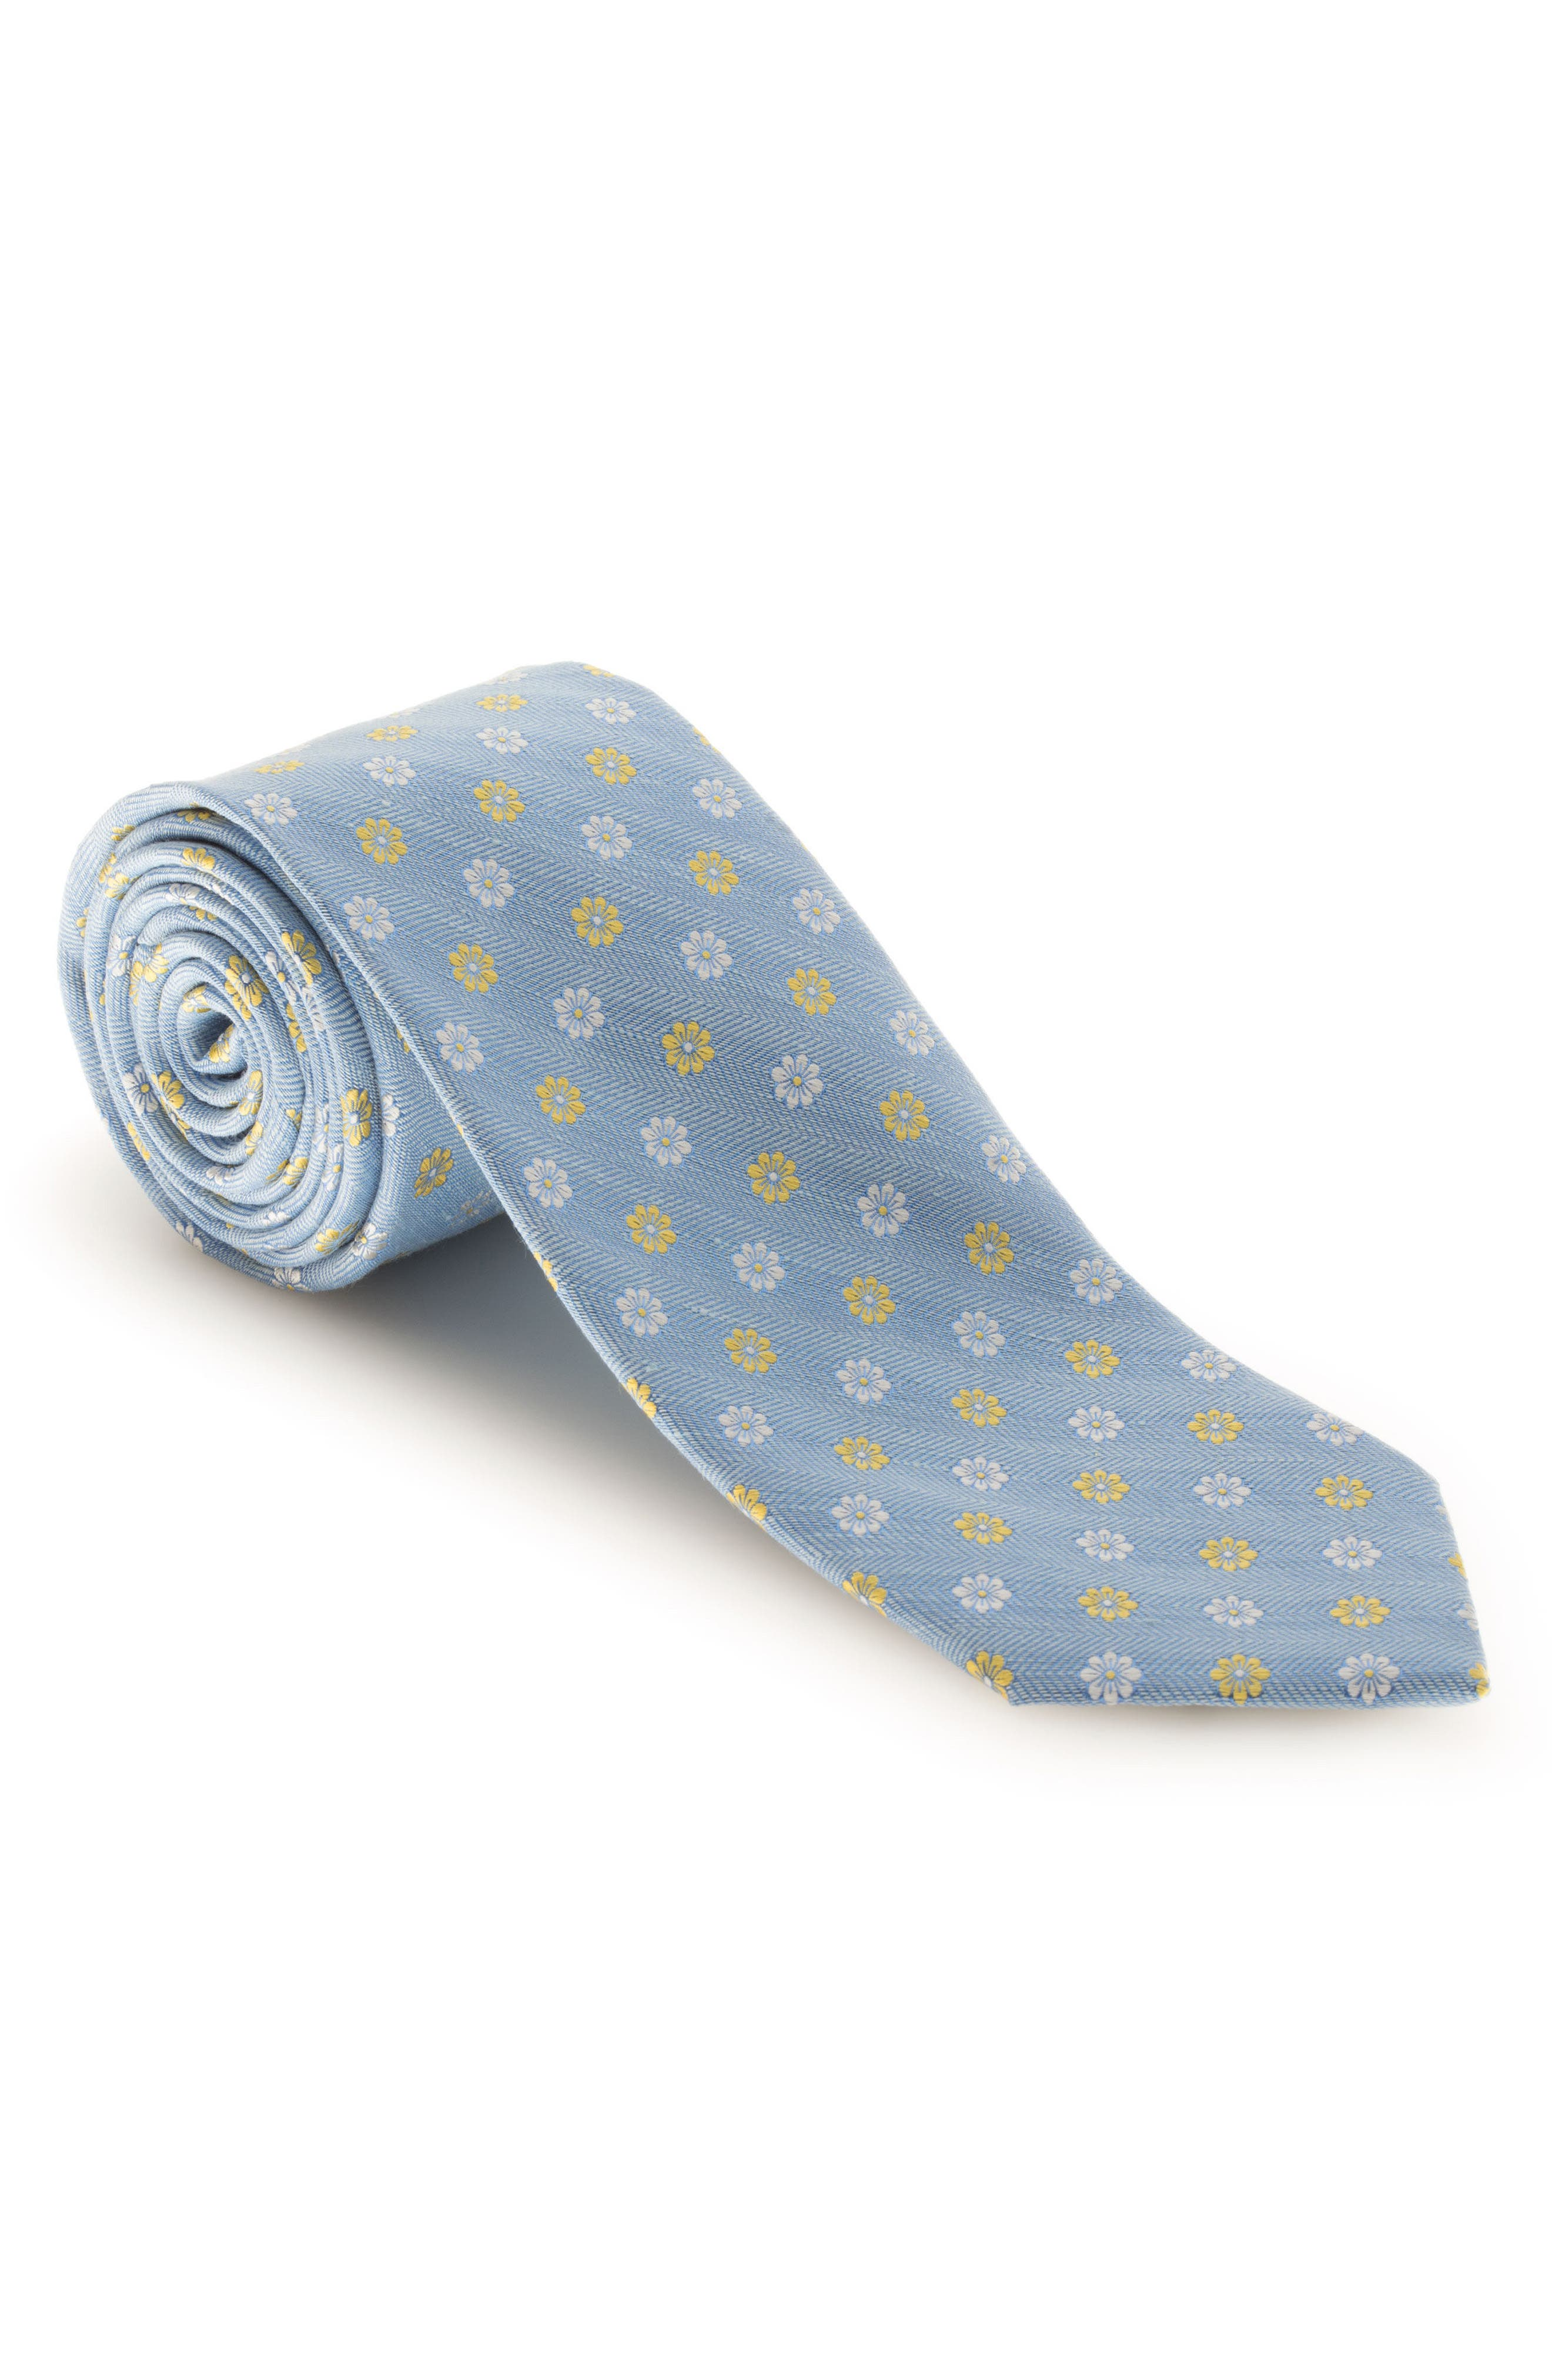 Alternate Image 1 Selected - Robert Talbott Floral Silk & Linen Tie